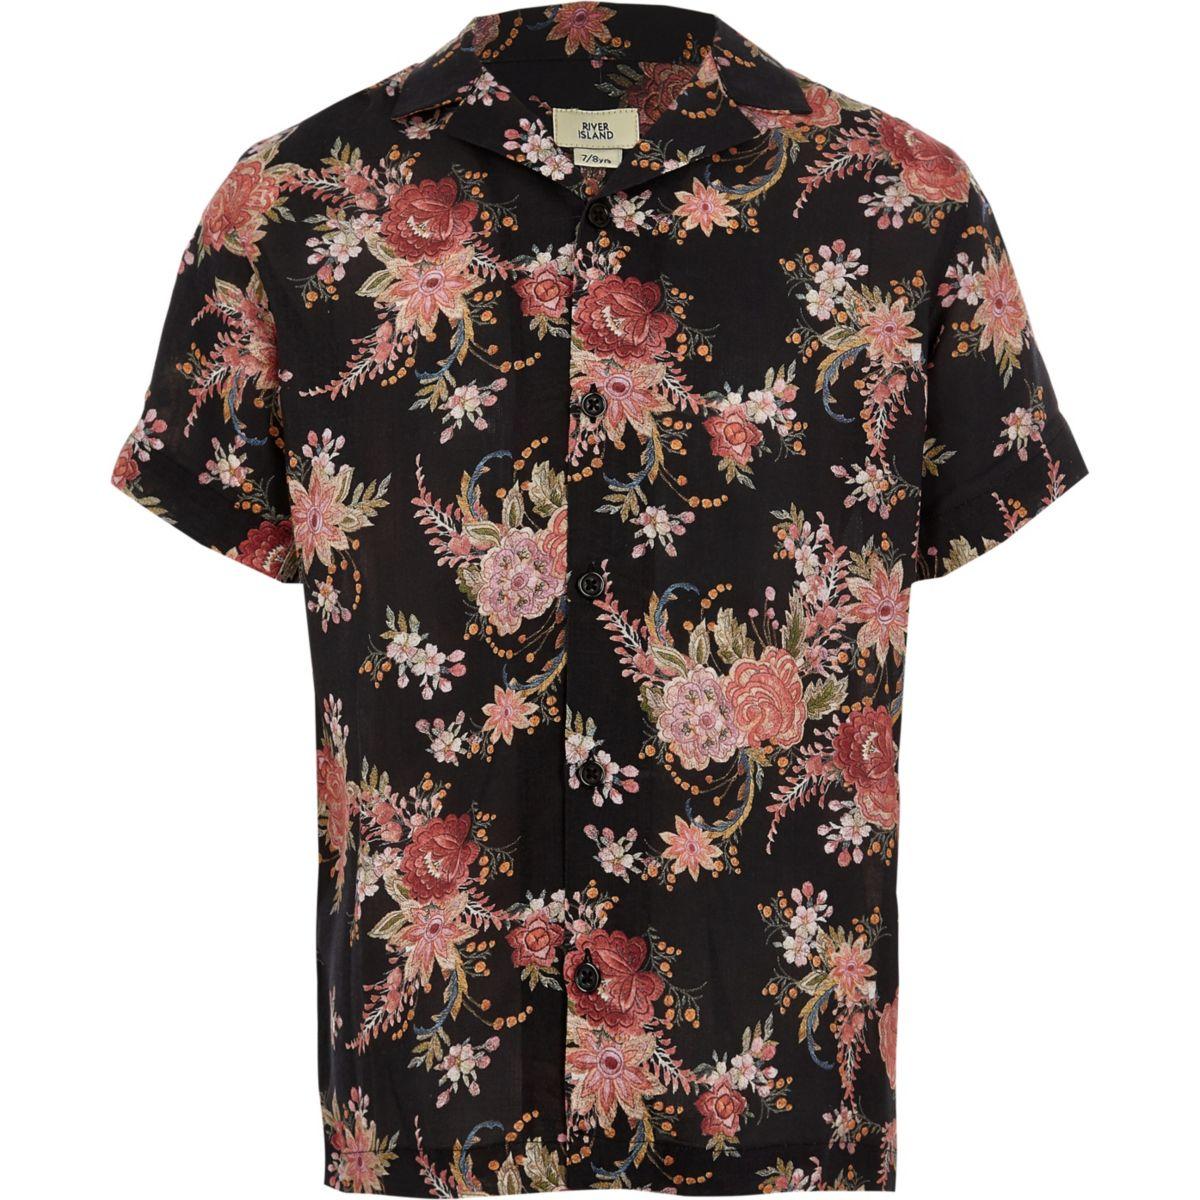 Boys black floral short sleeve shirt